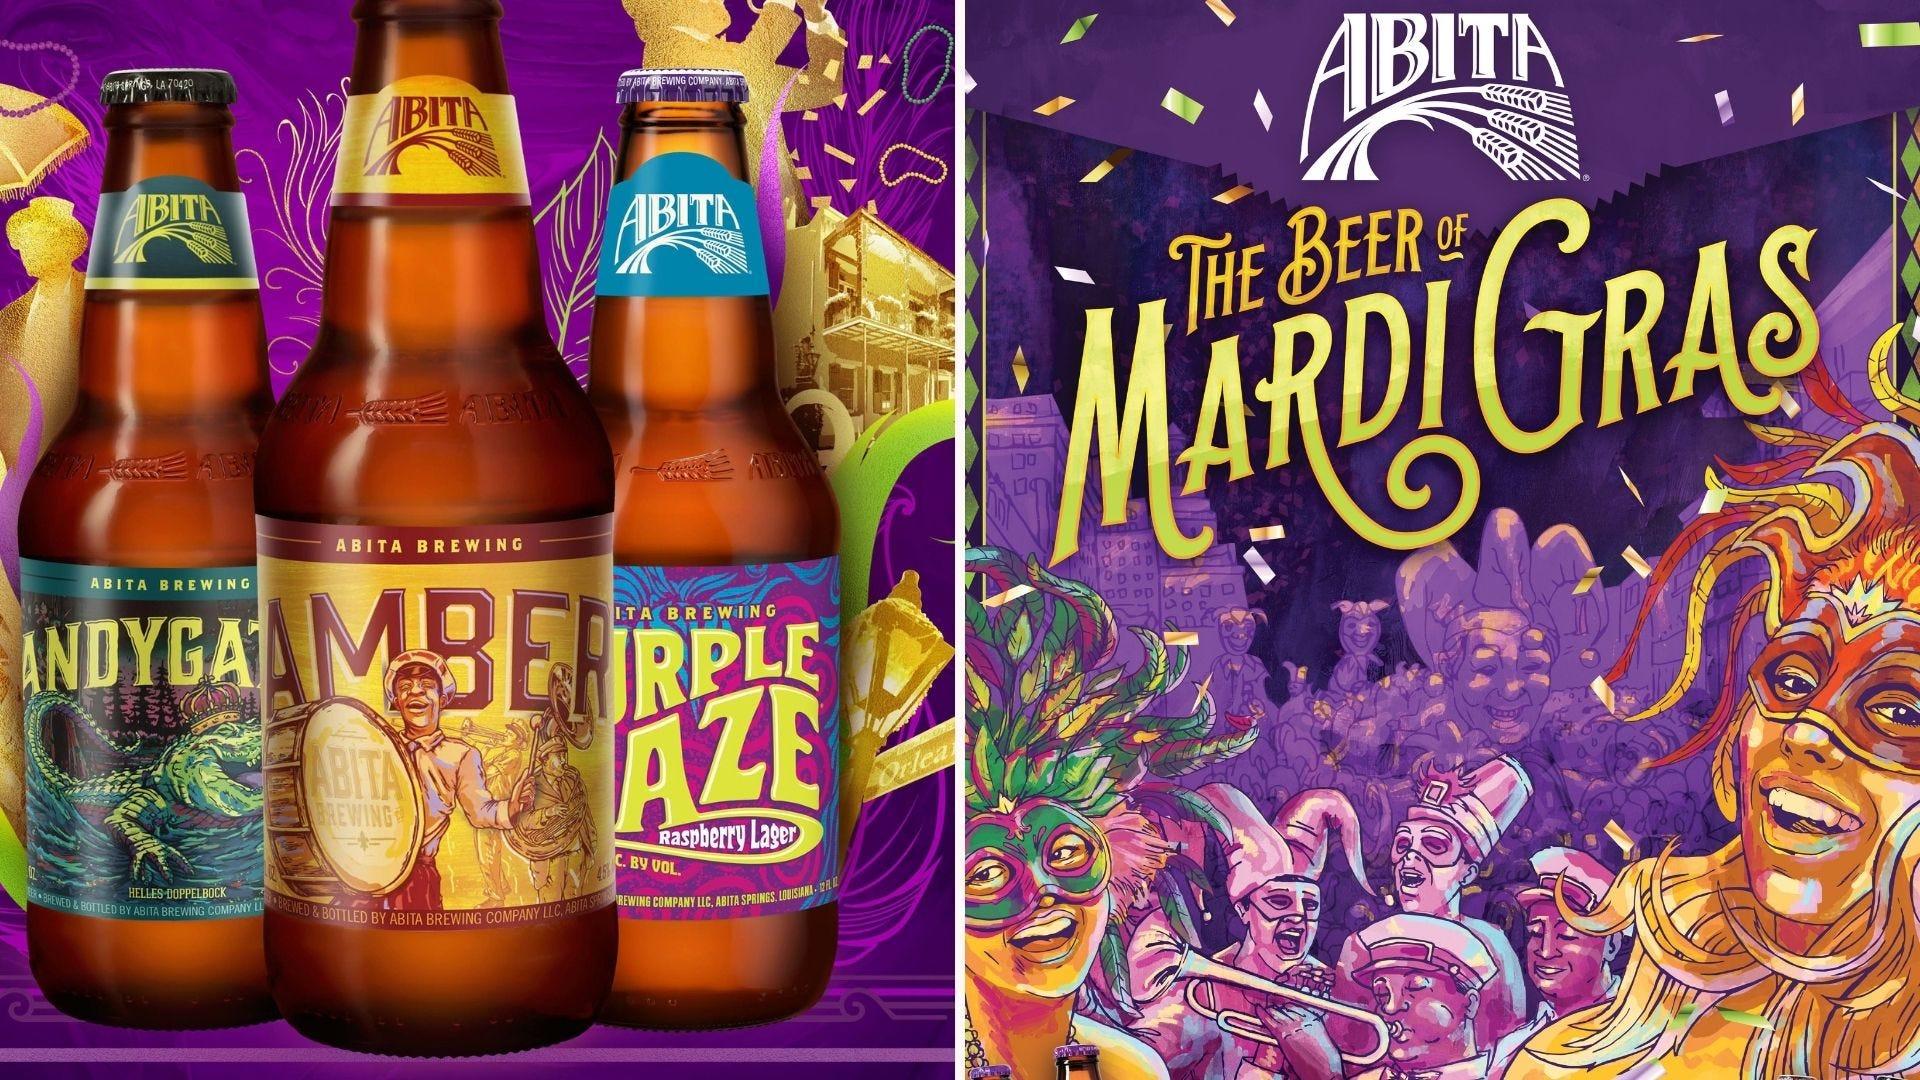 Examples of Abita beers.